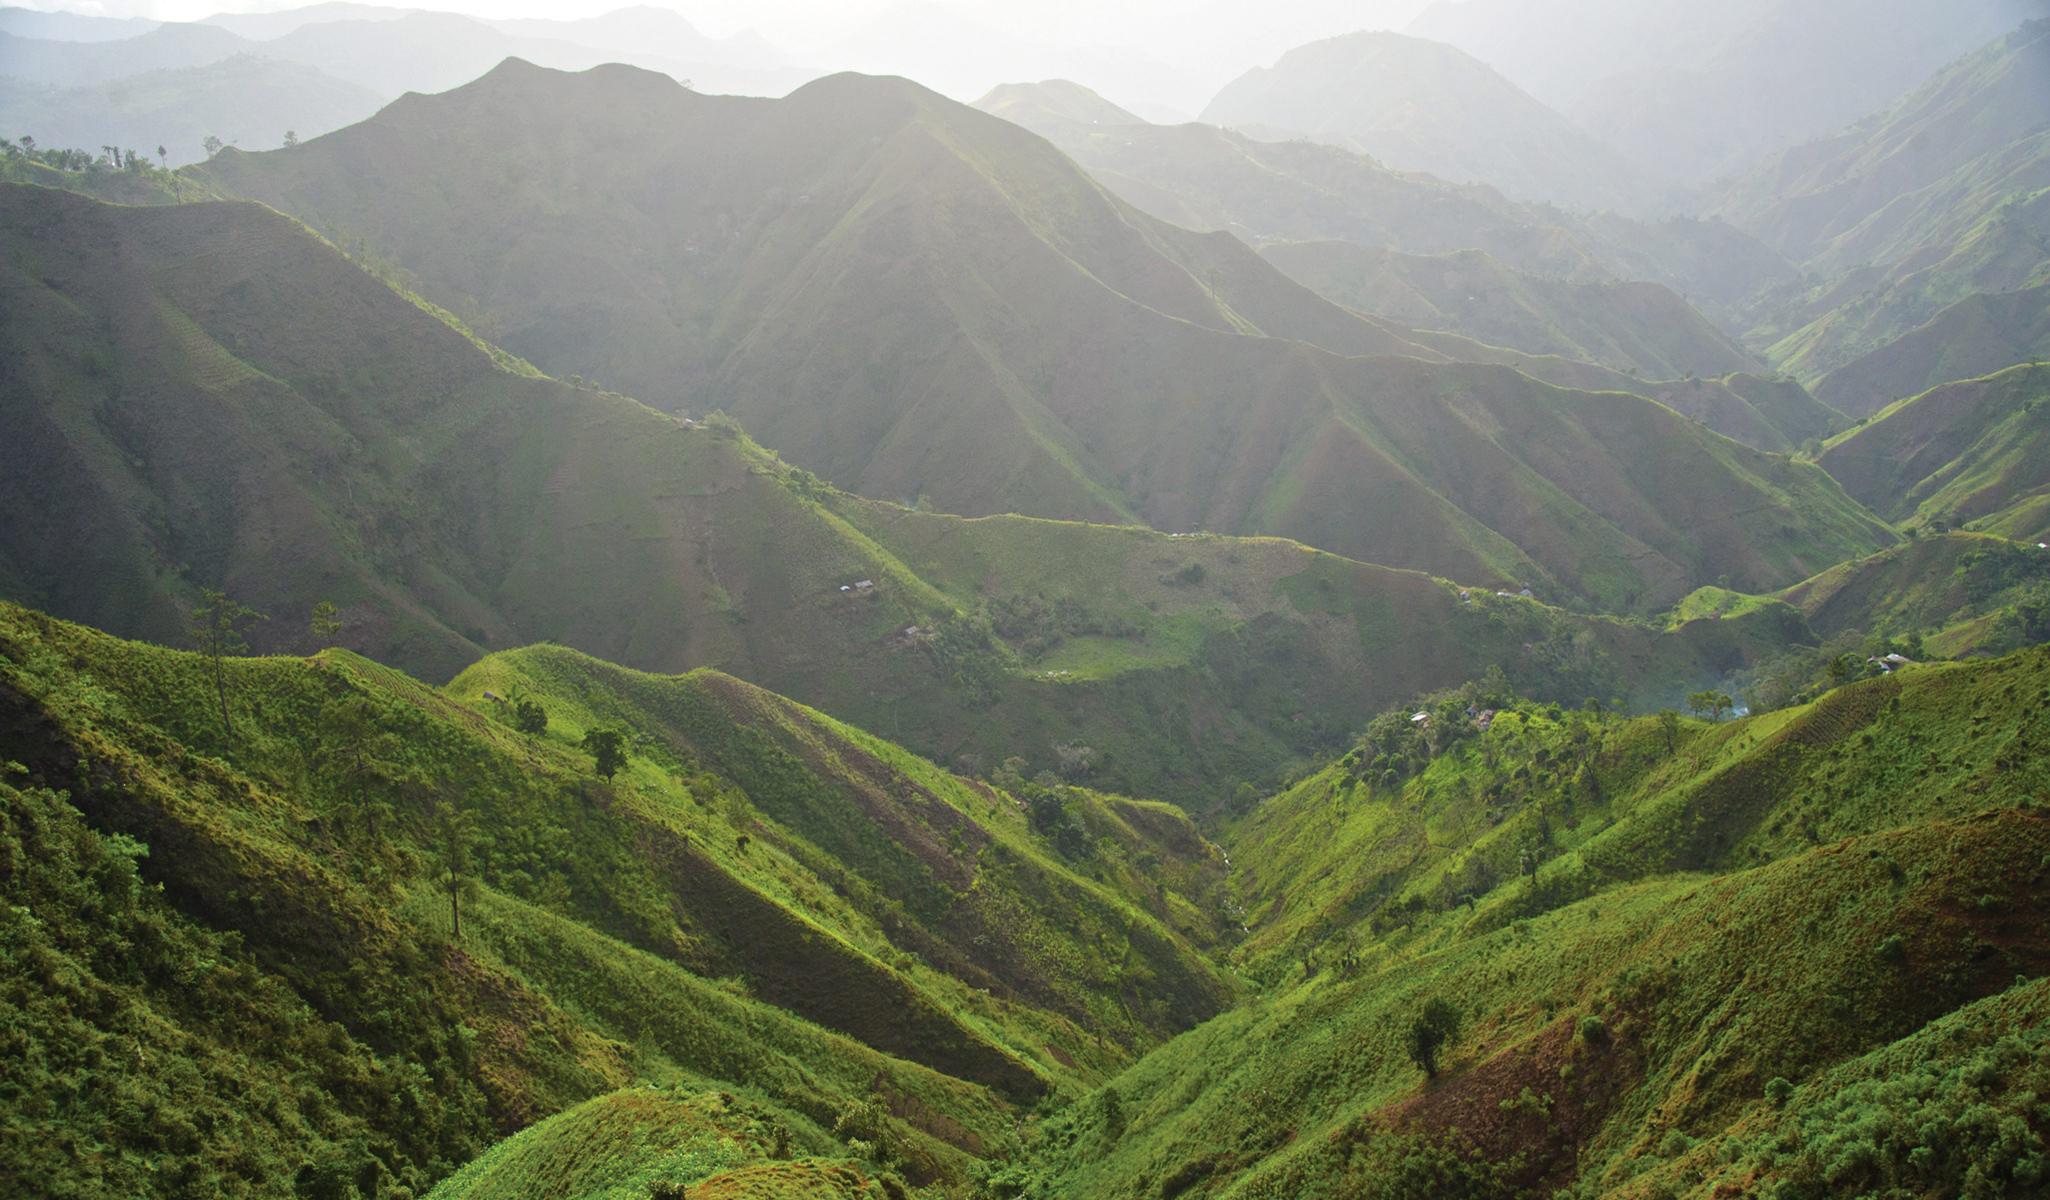 haiti-port-au-prince-montagnes-mountains-2050x1200.aspx.jpg